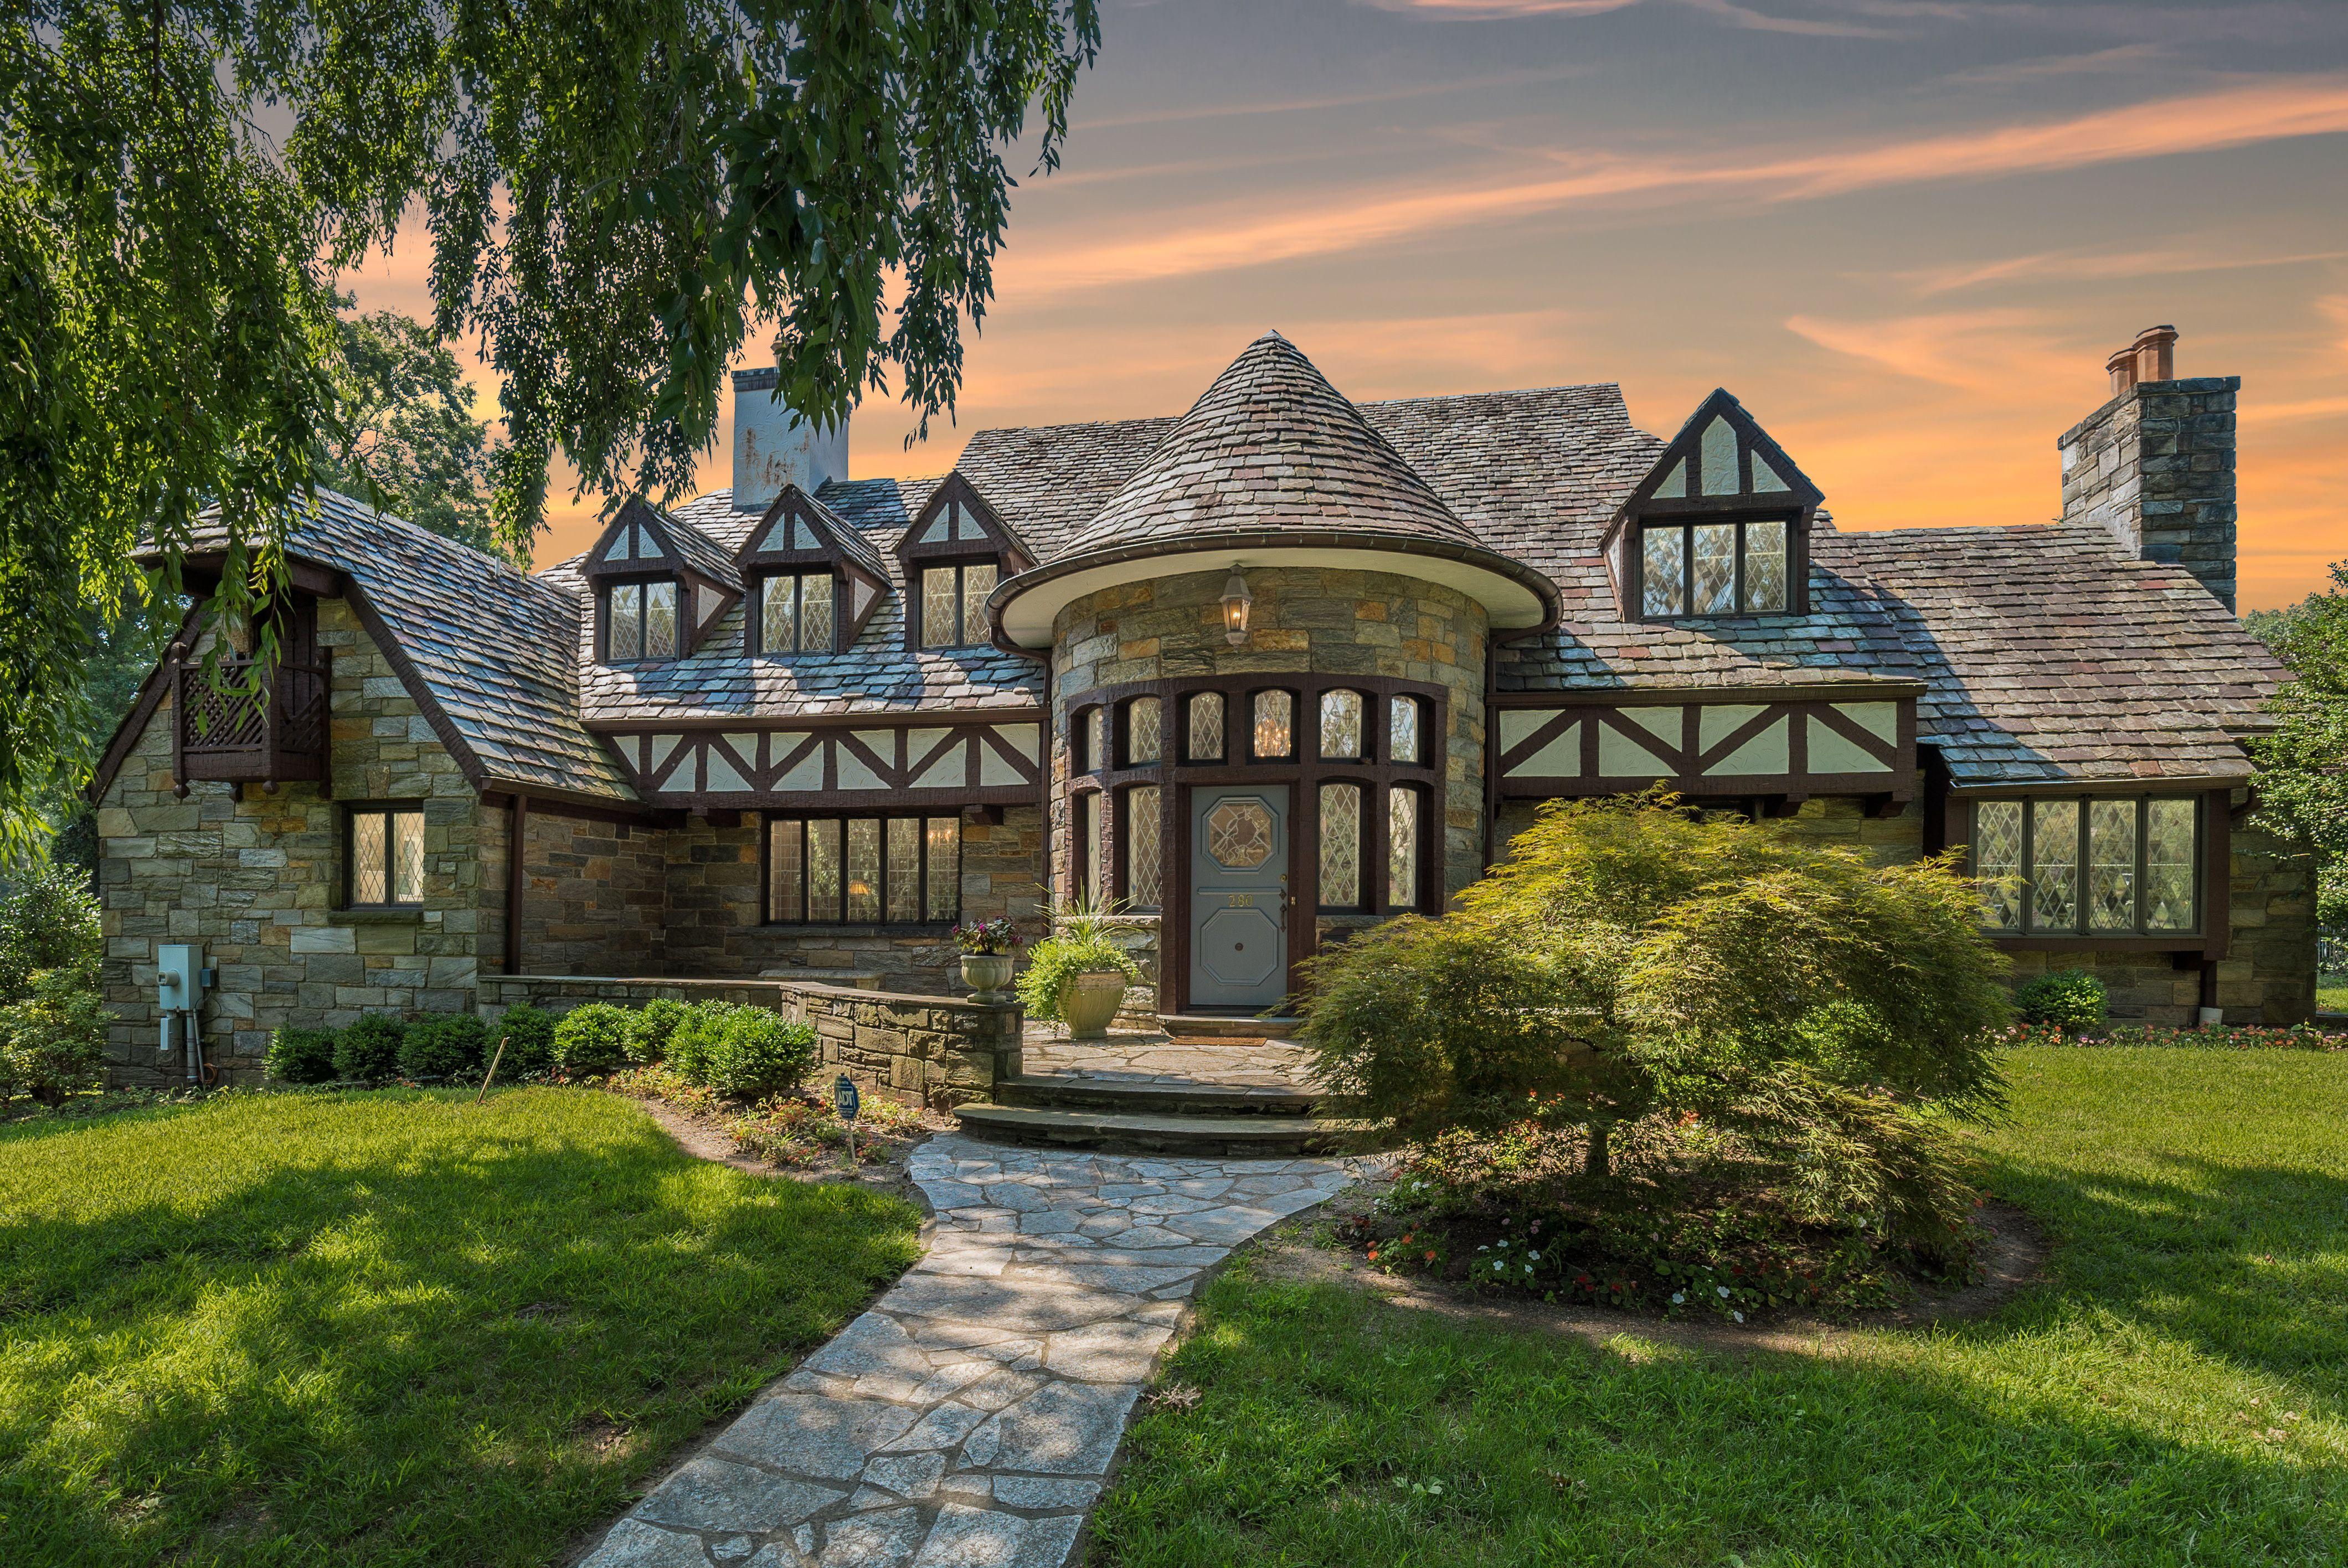 Exquisite home for sale in ridgewood nj 07450 ridgewood